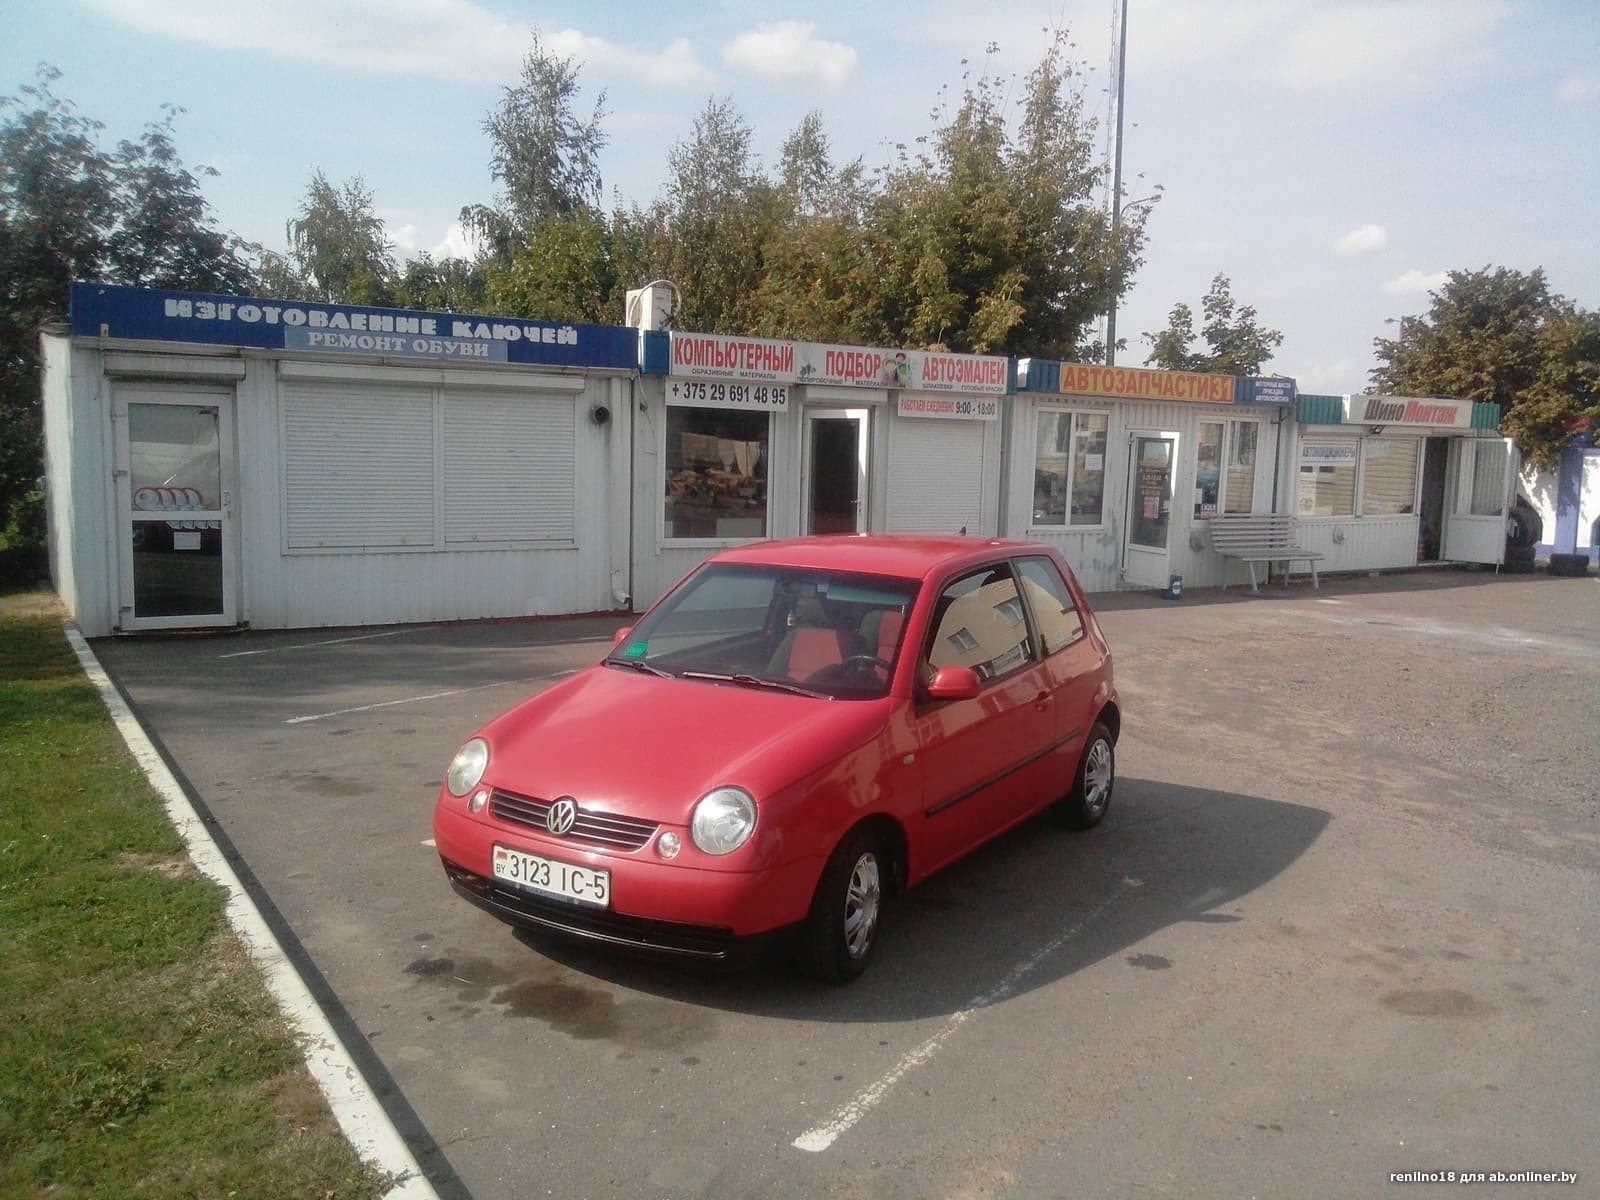 Volkswagen Lupo Sdi